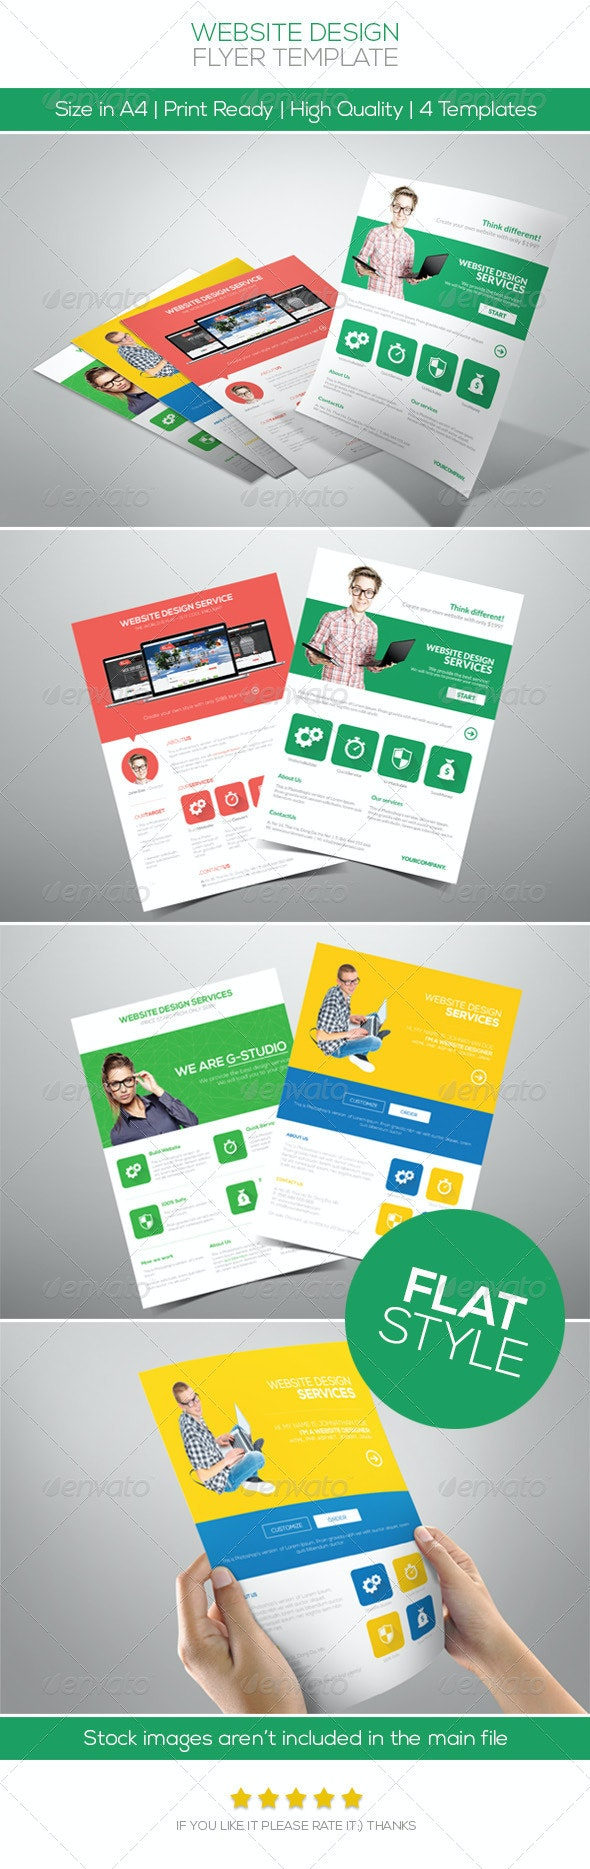 Flat Website Design Flyer - Commerce Flyers